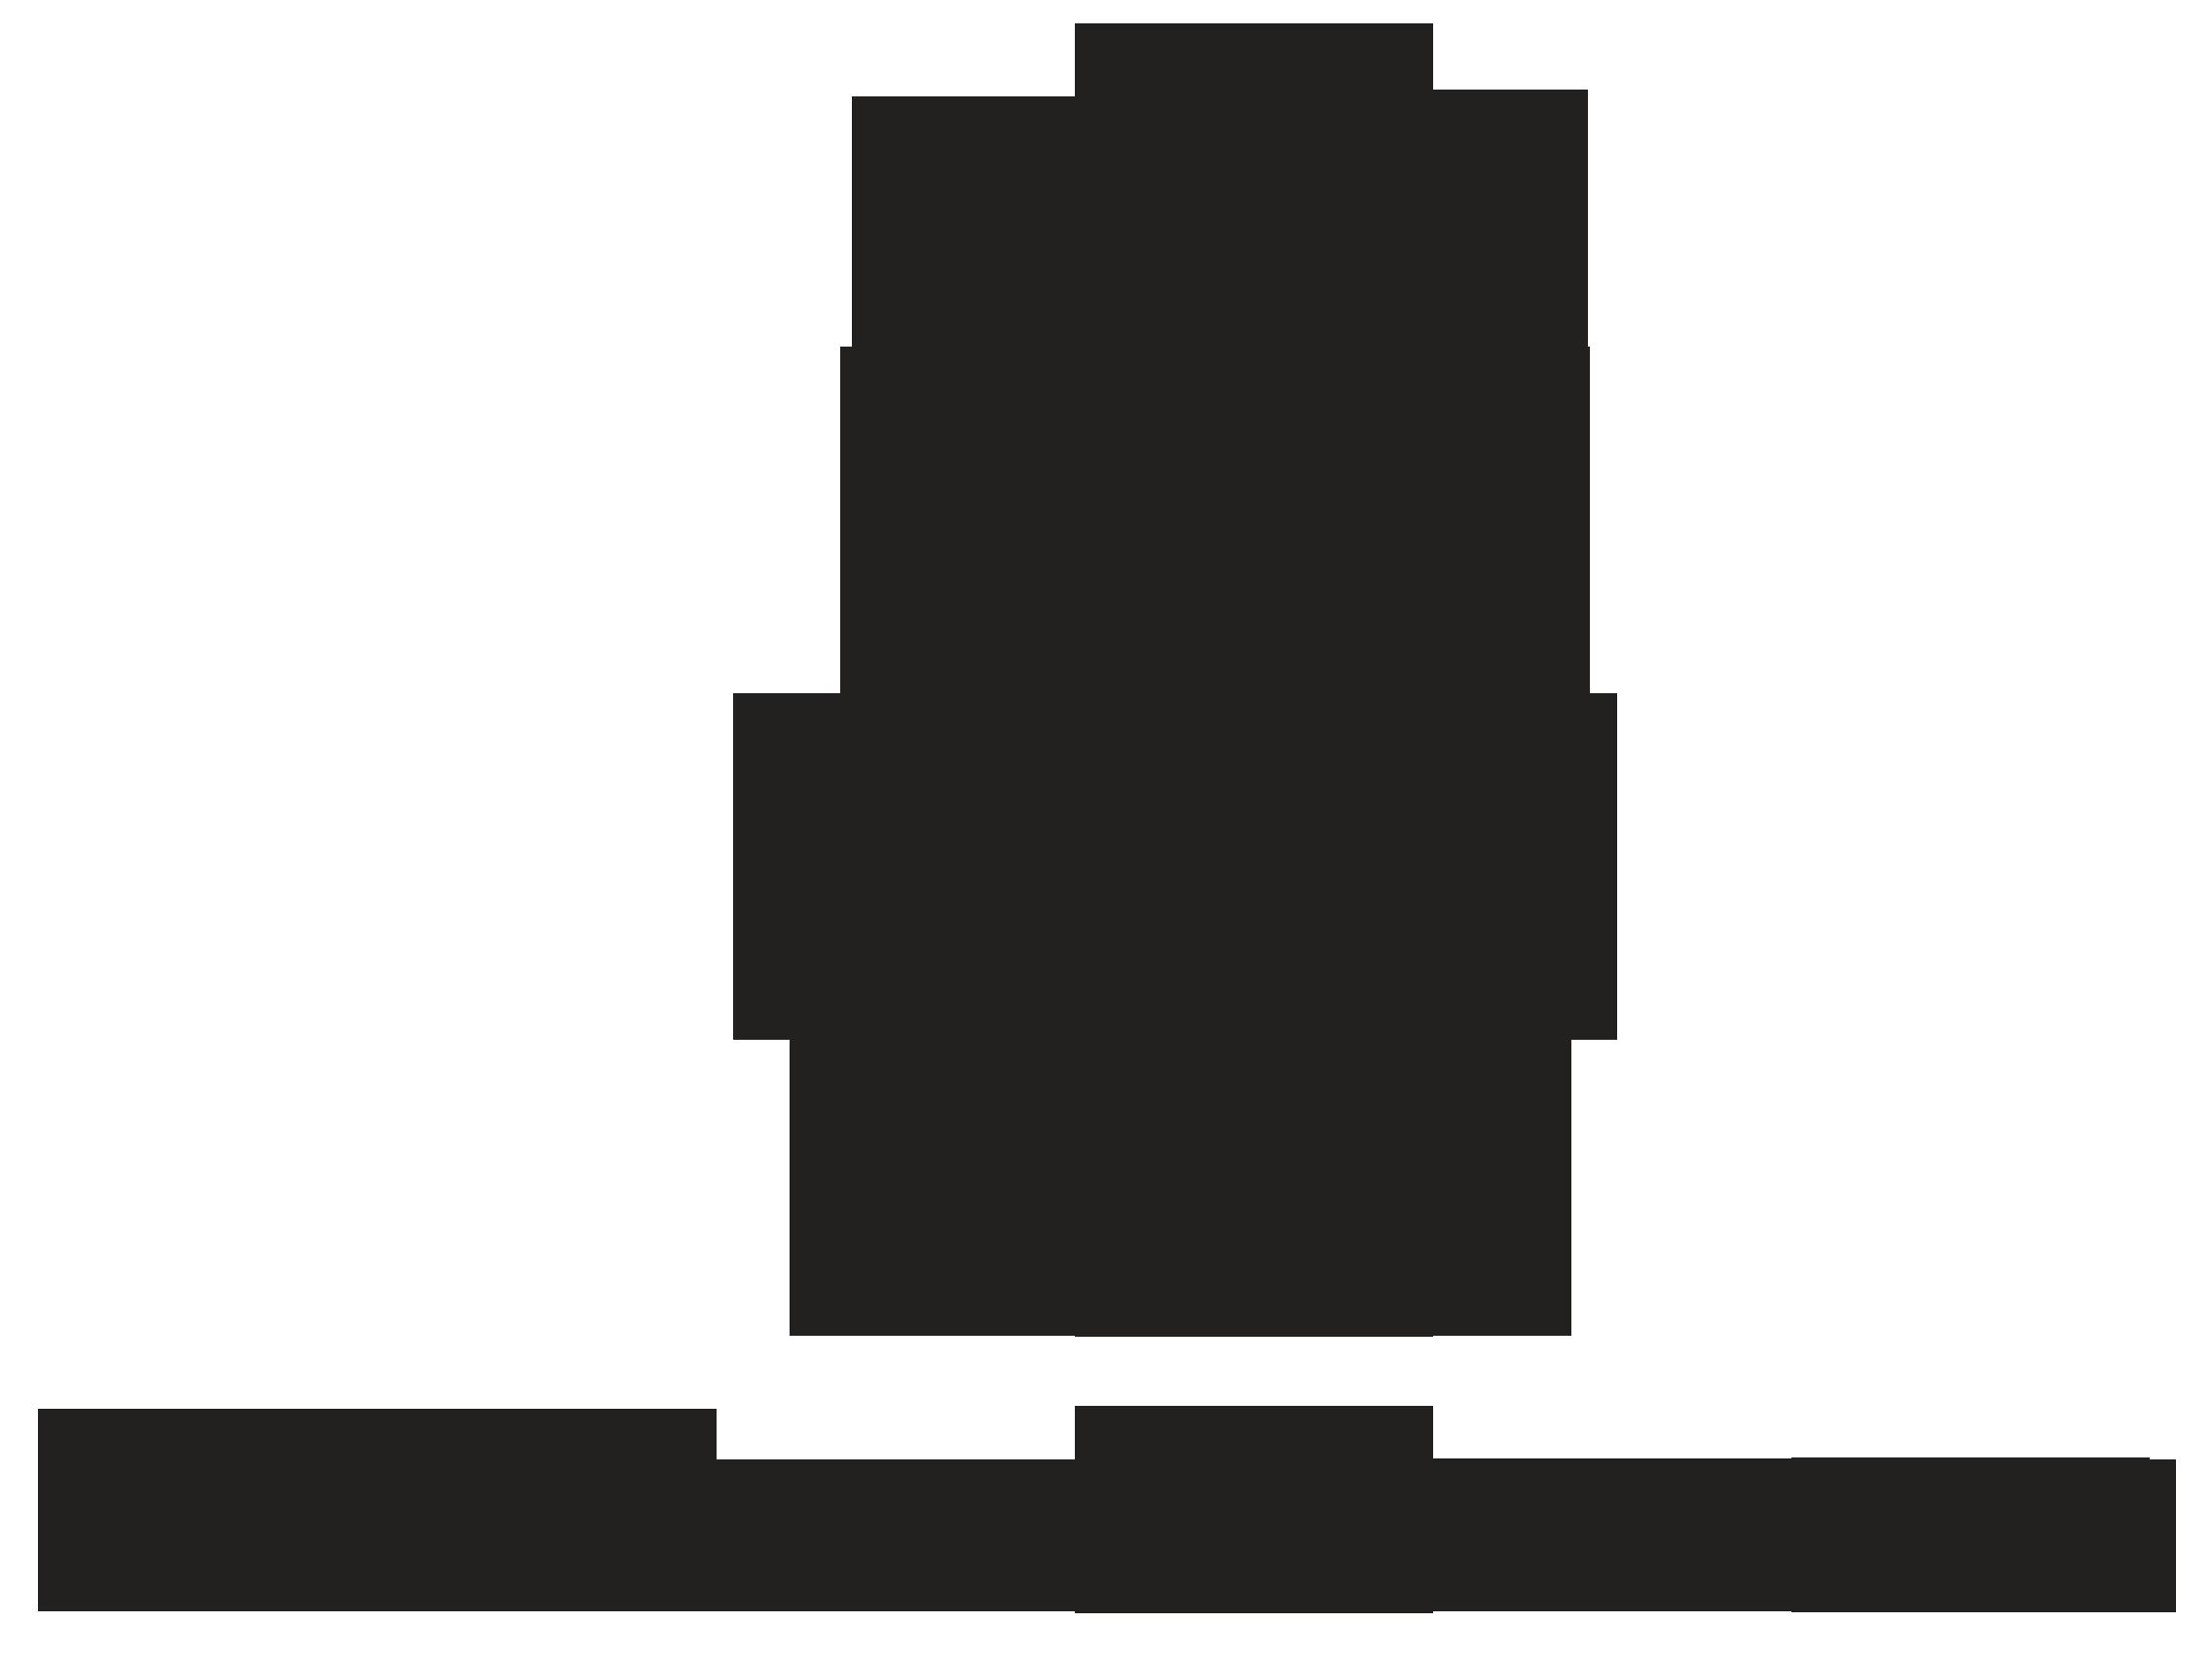 ritz-carlton-logo-and-wordmark